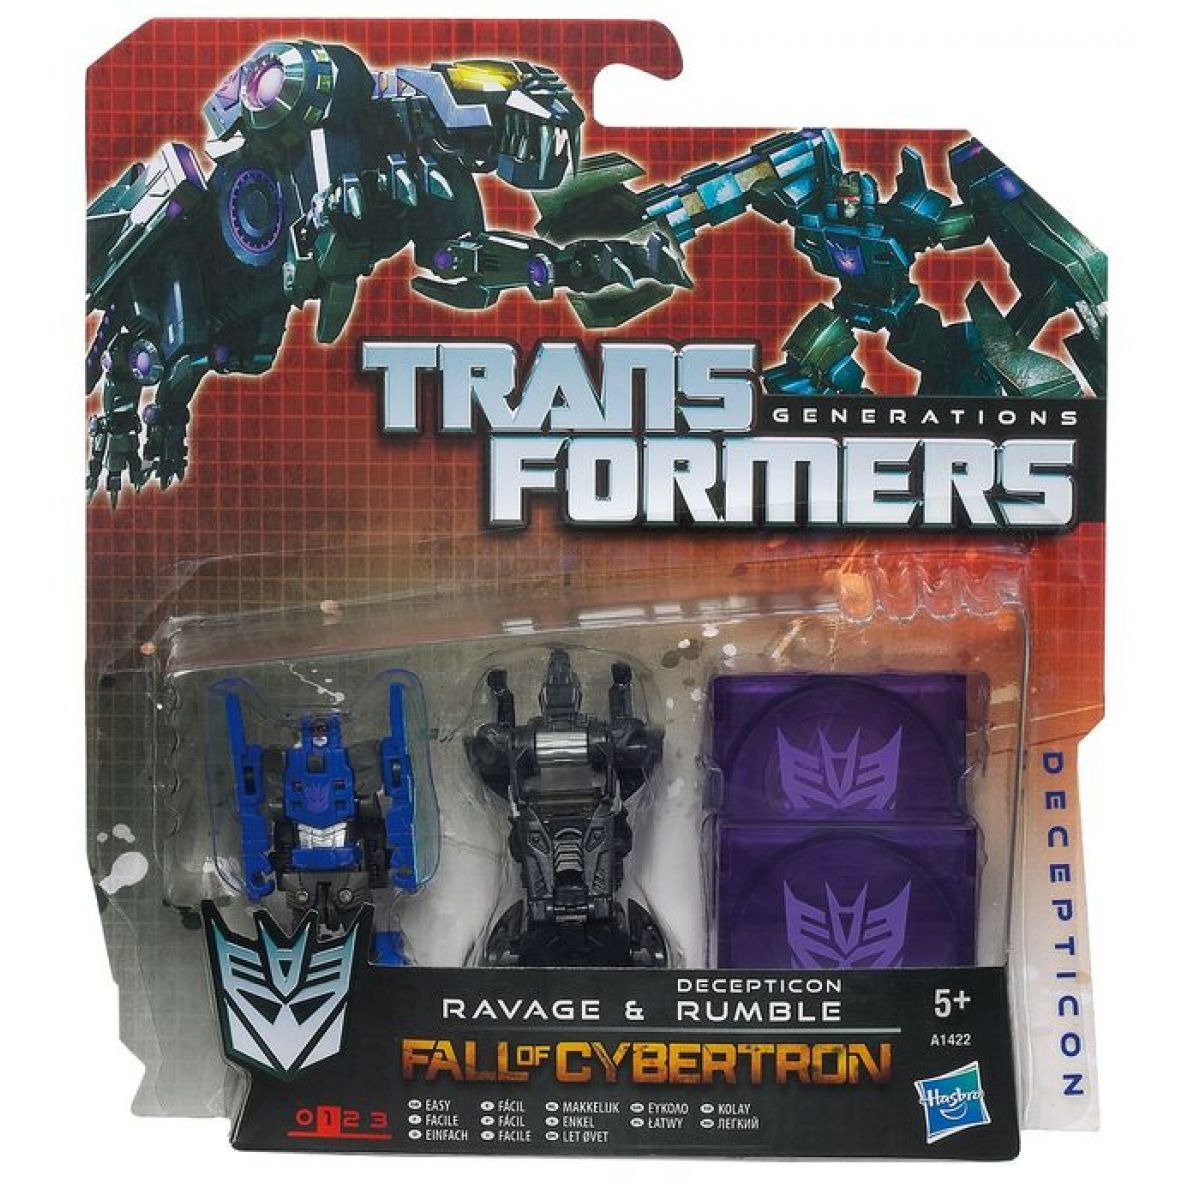 Hasbro Transformers Generations transformovatelné disky  A1421 - A 1423 Frenzy&Ratbat